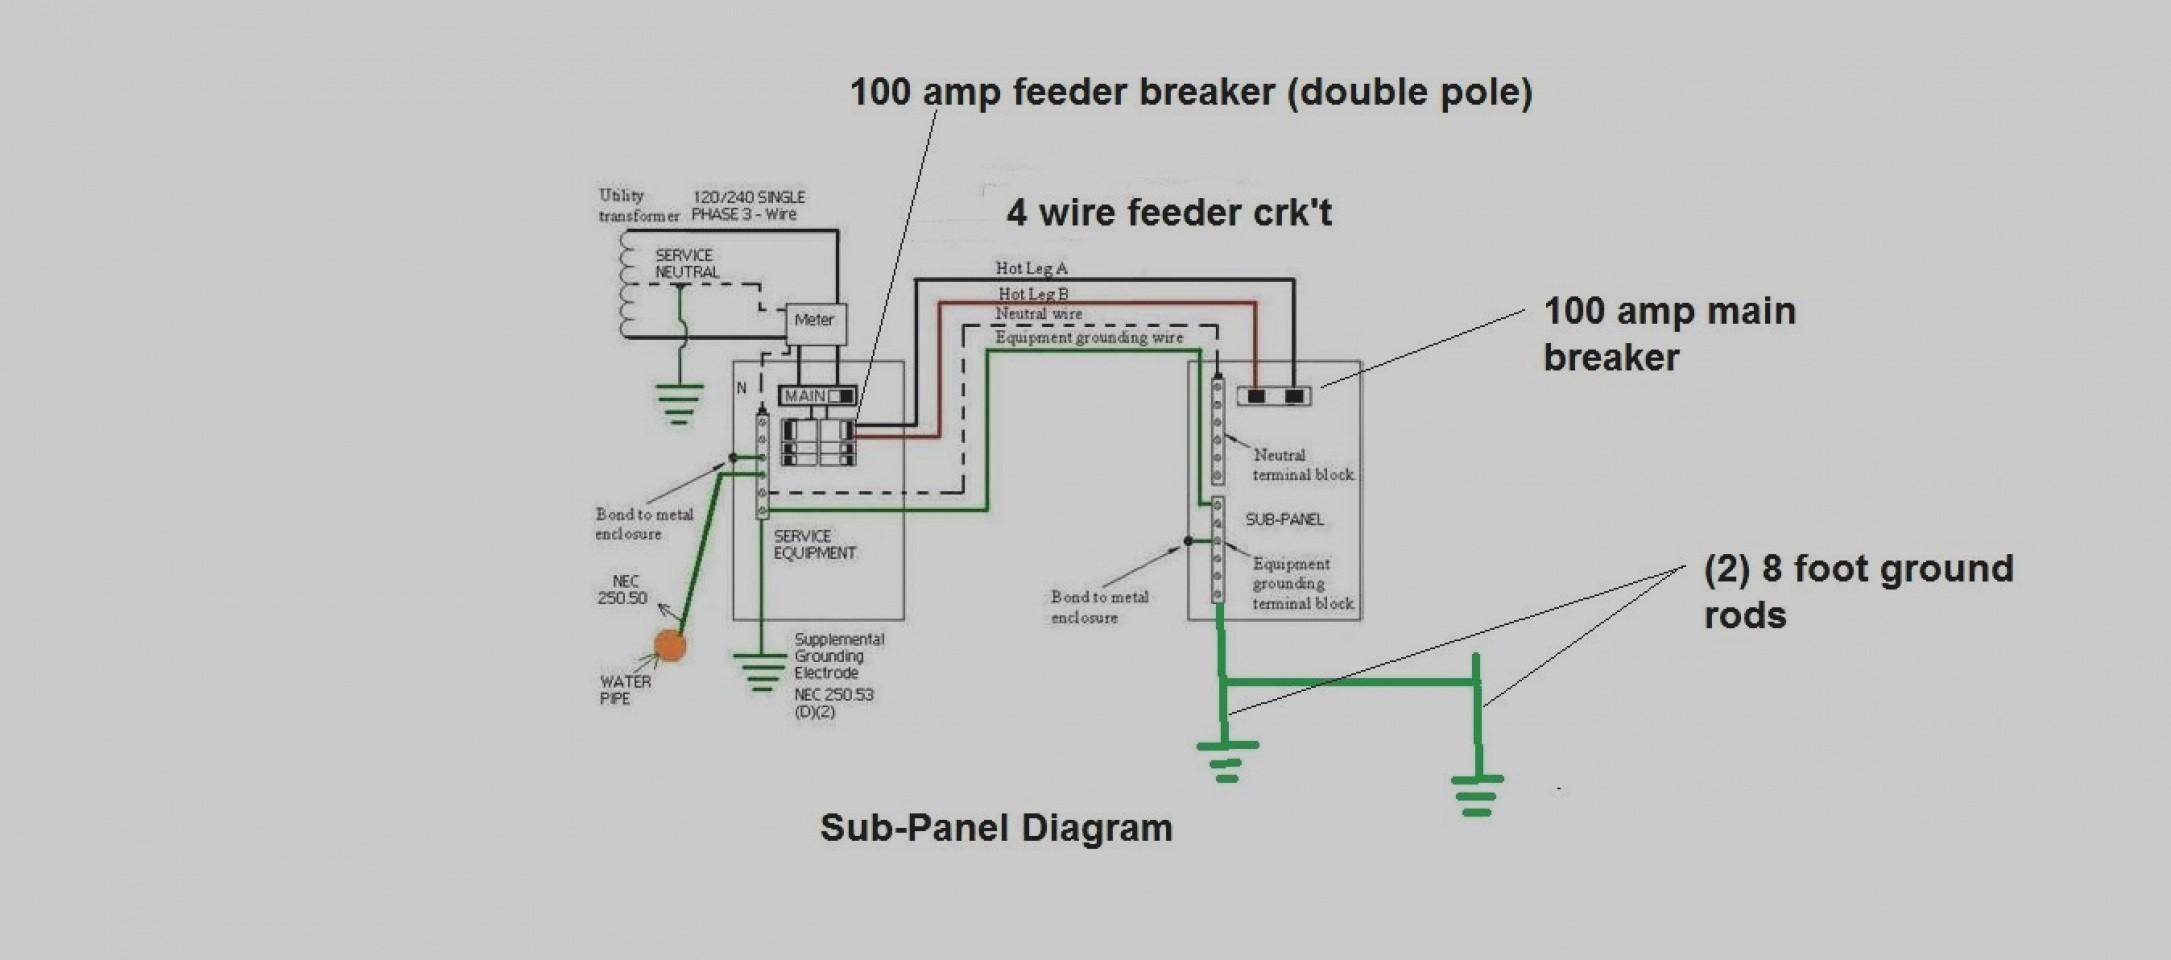 [FPER_4992]  5915A59 Elegant Detached Garage Sub Panel Wiring Diagram | Wiring ... |  Wiring Library | Detached Garage Sub Panel Wiring |  | Wiring Library